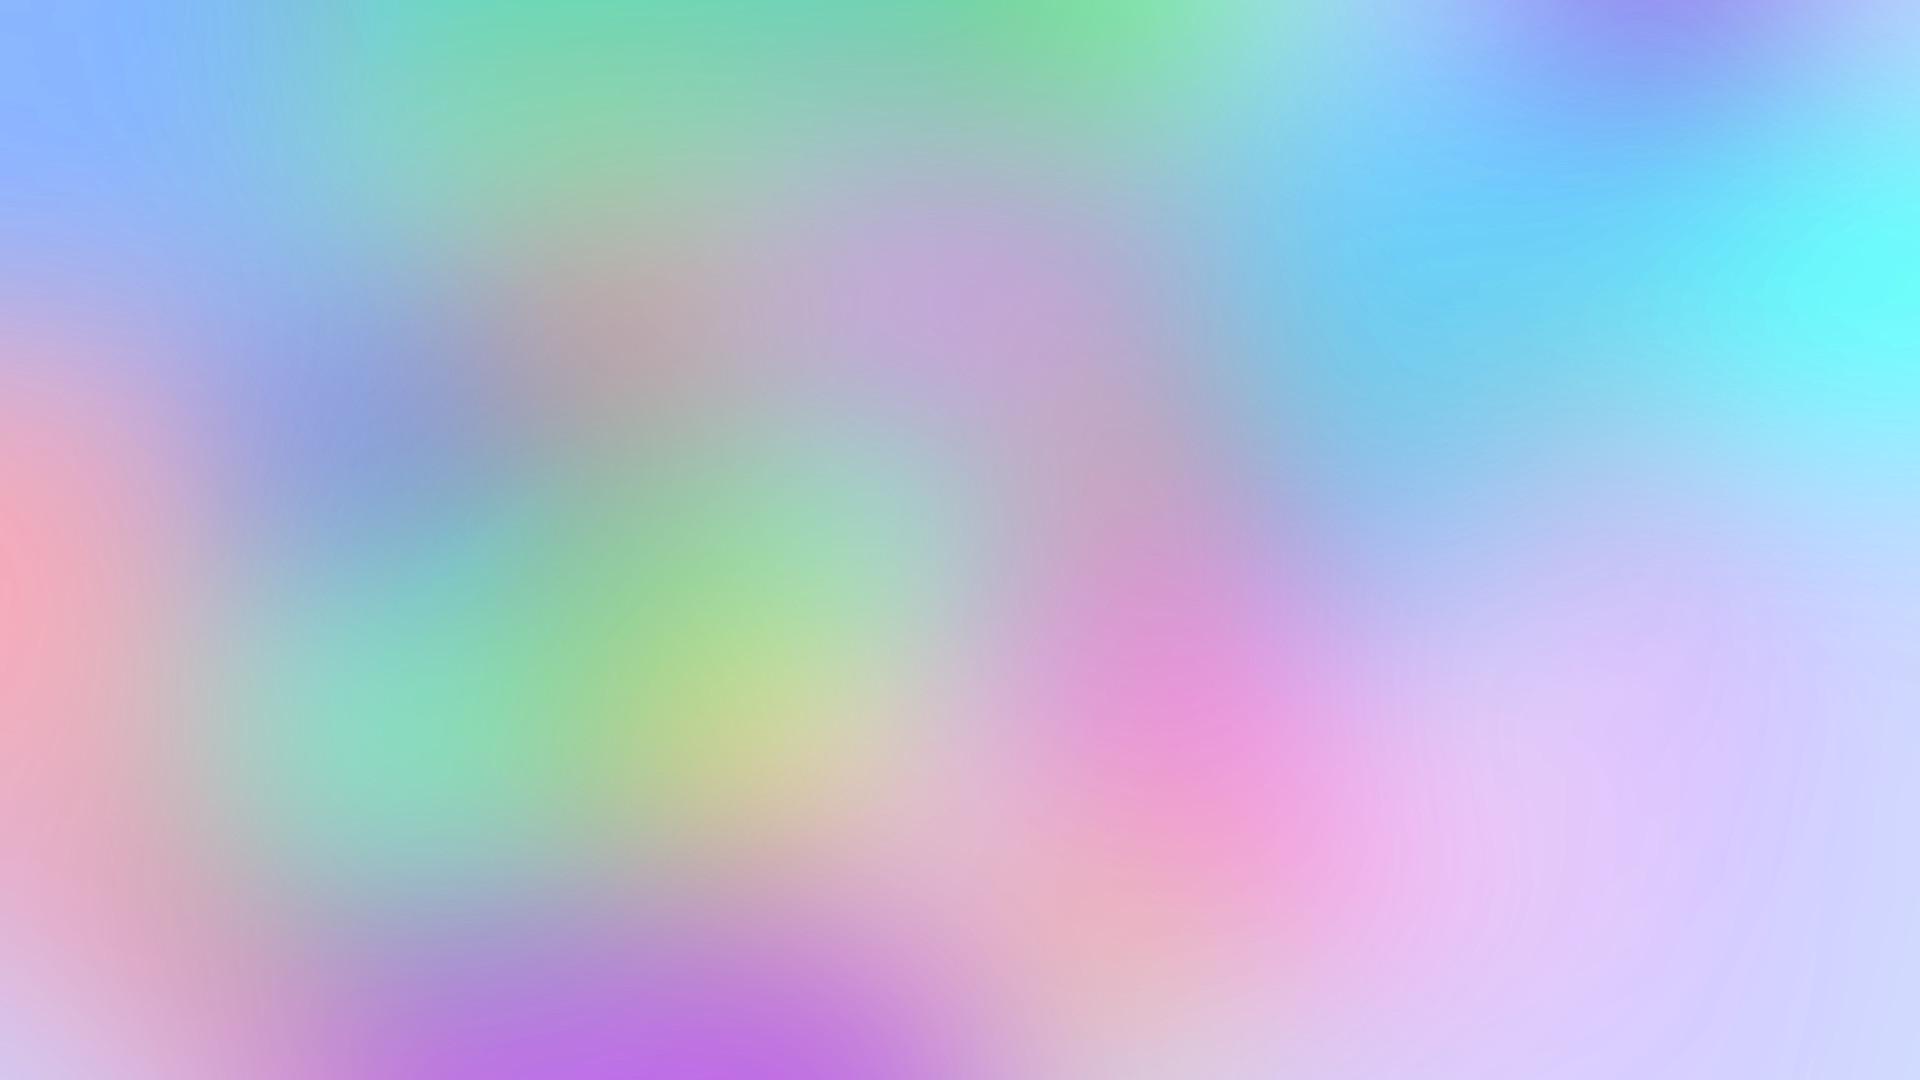 rainbows backgrounds 51 images